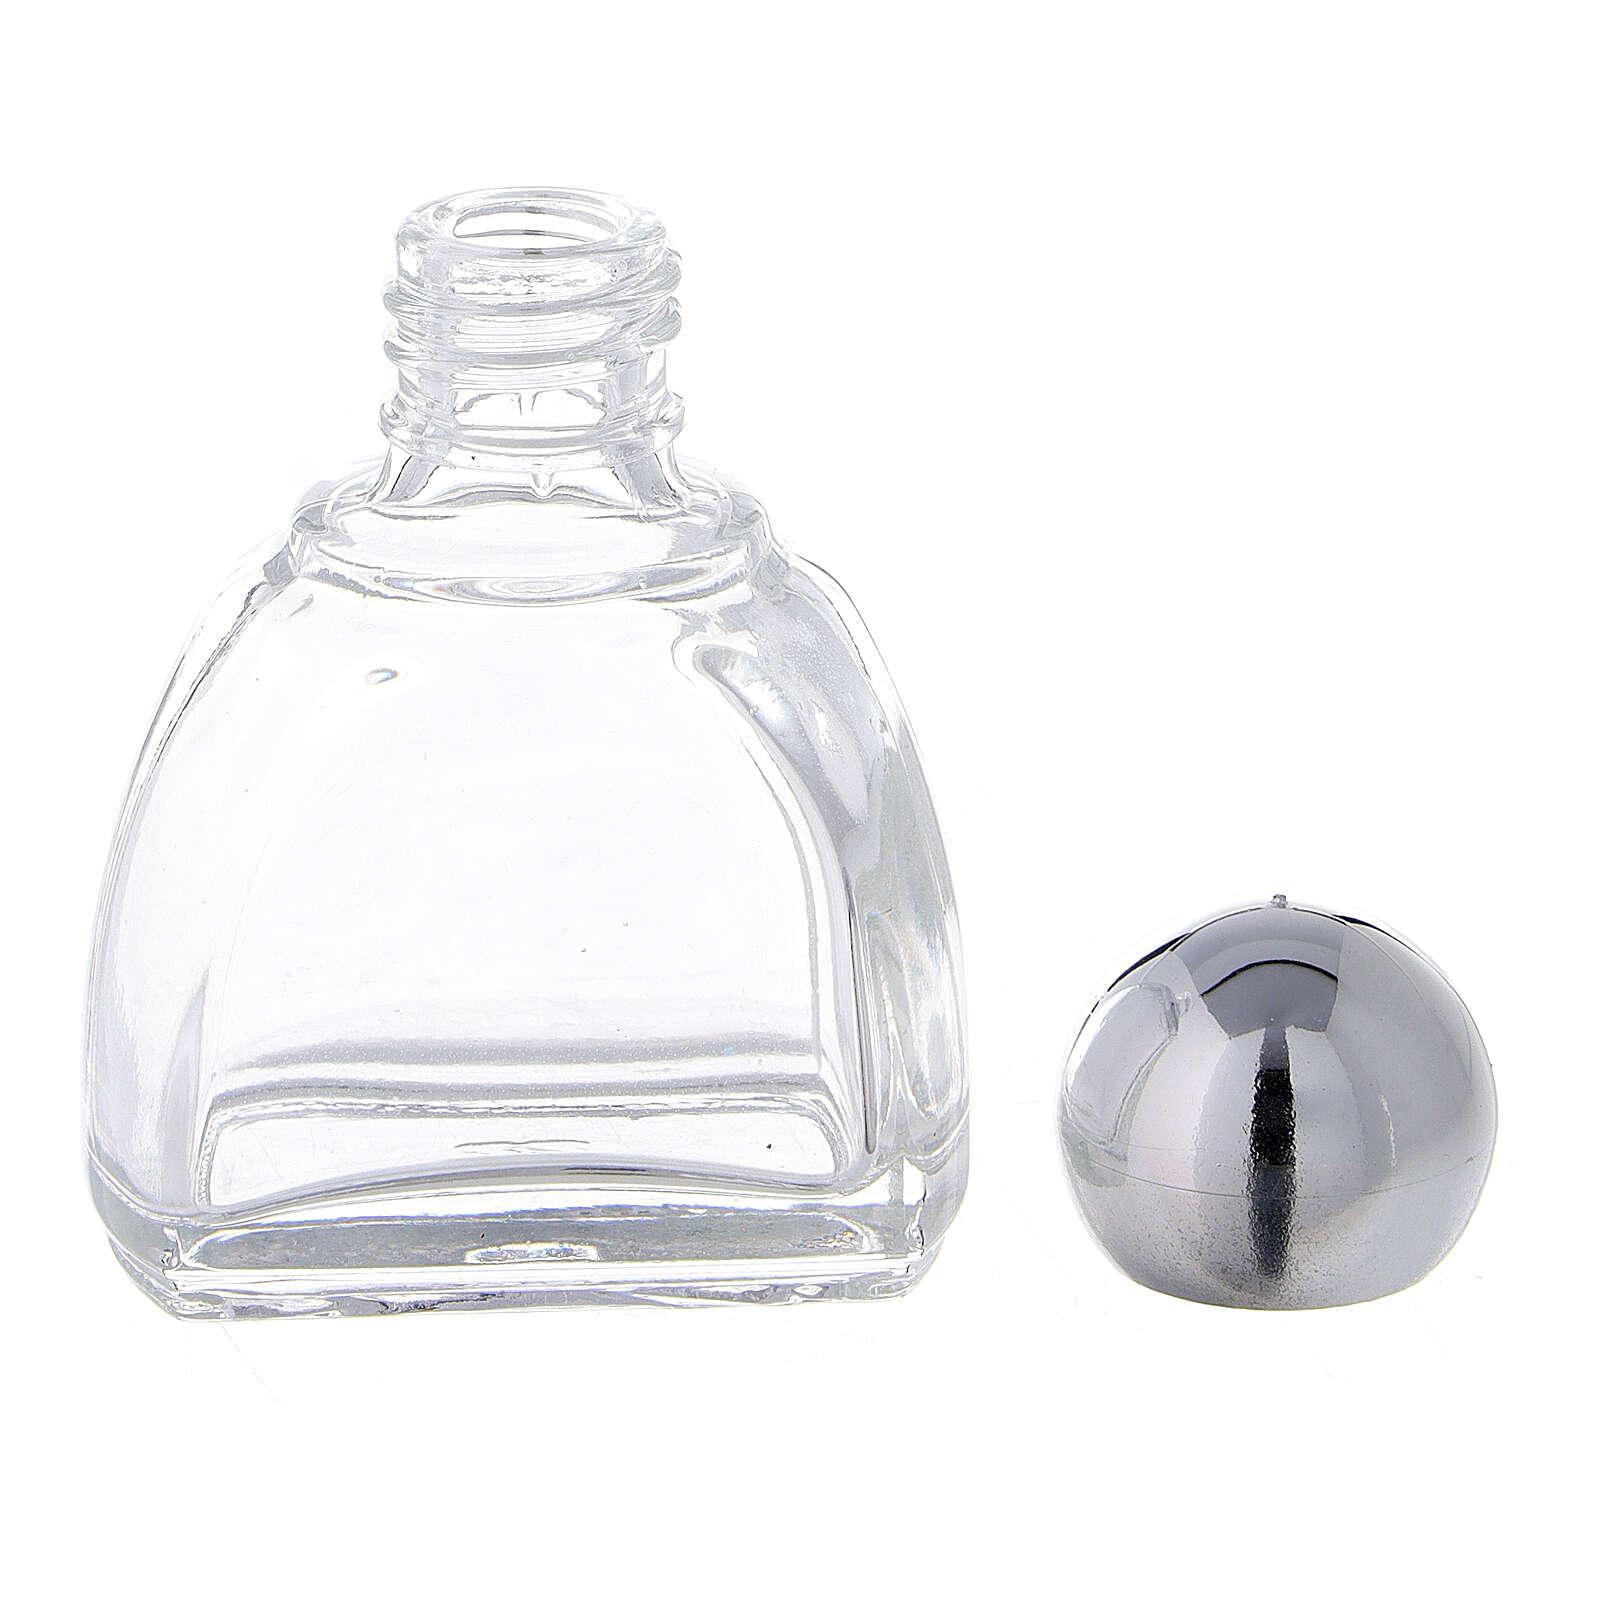 Botella agua bendita 12 ml de vidrio (CAJA 50 PIEZAS) 3